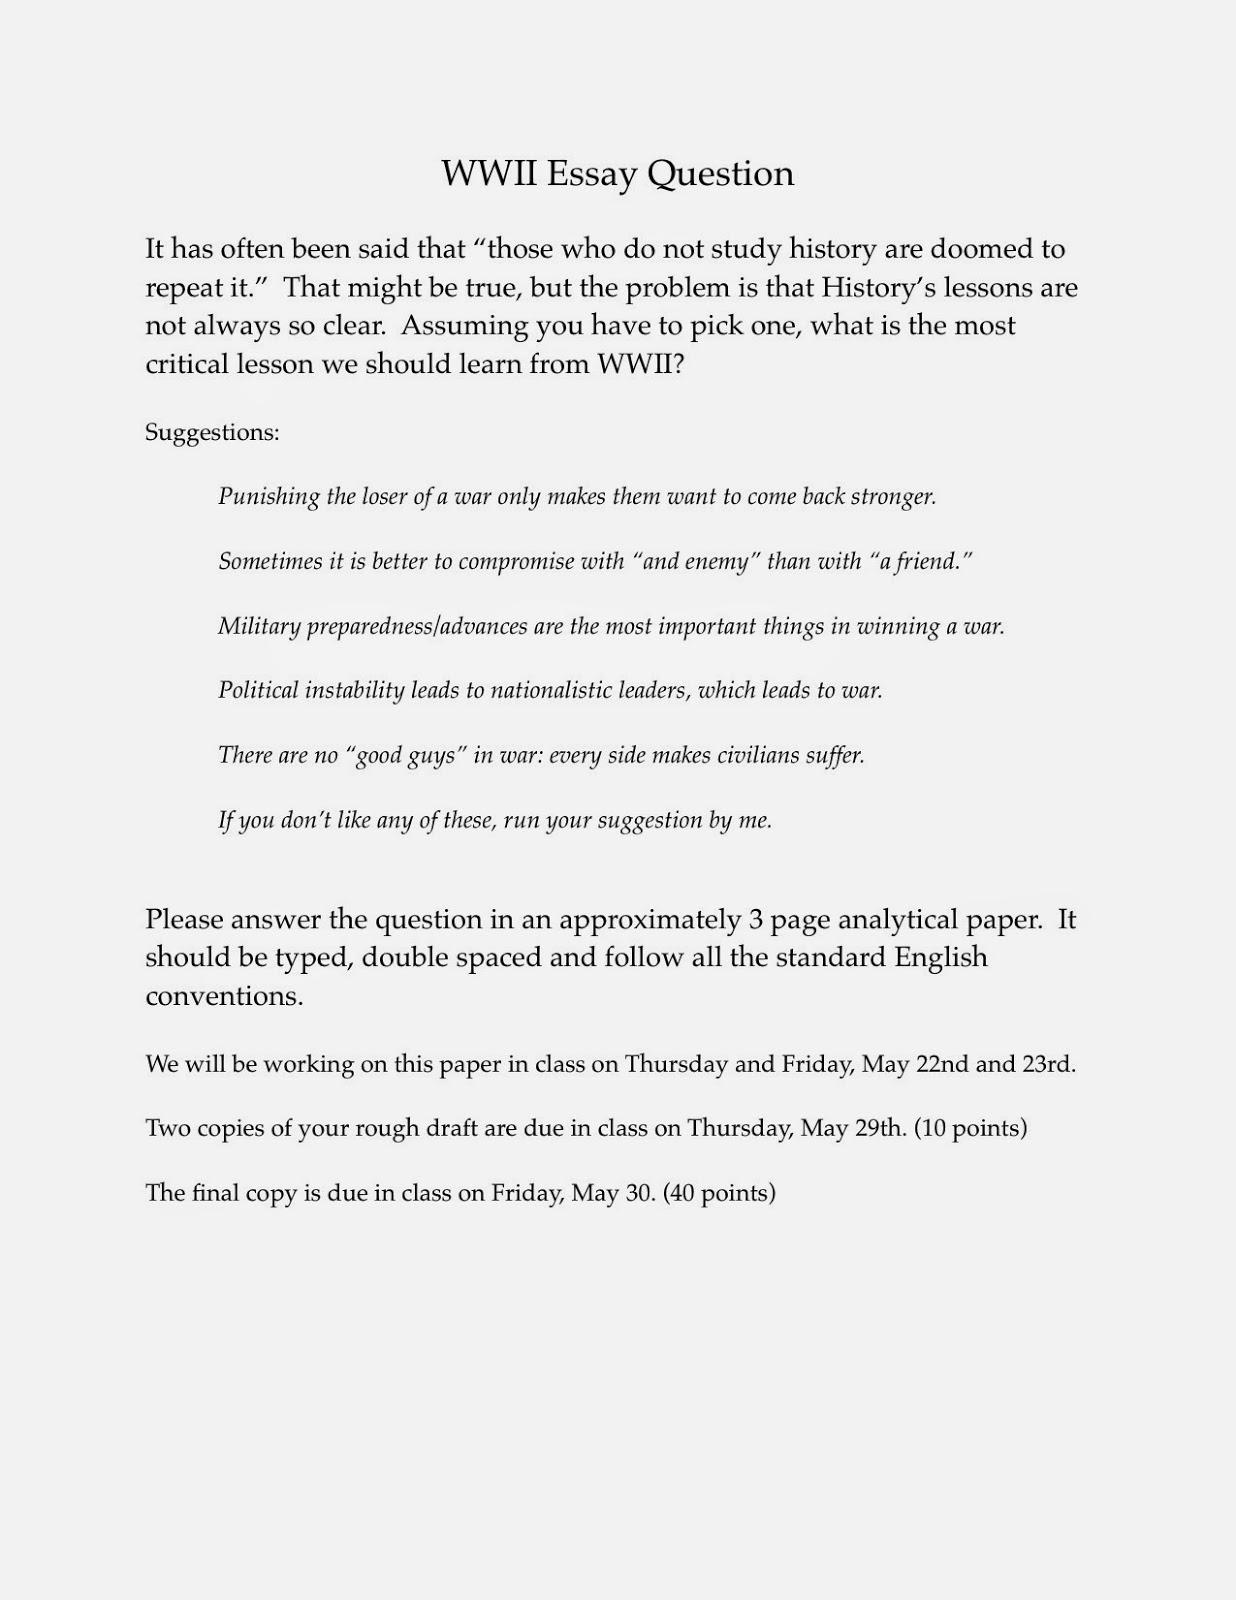 Modern Classroom Paragraph : Ms murphy s modern european history class wwii essay and